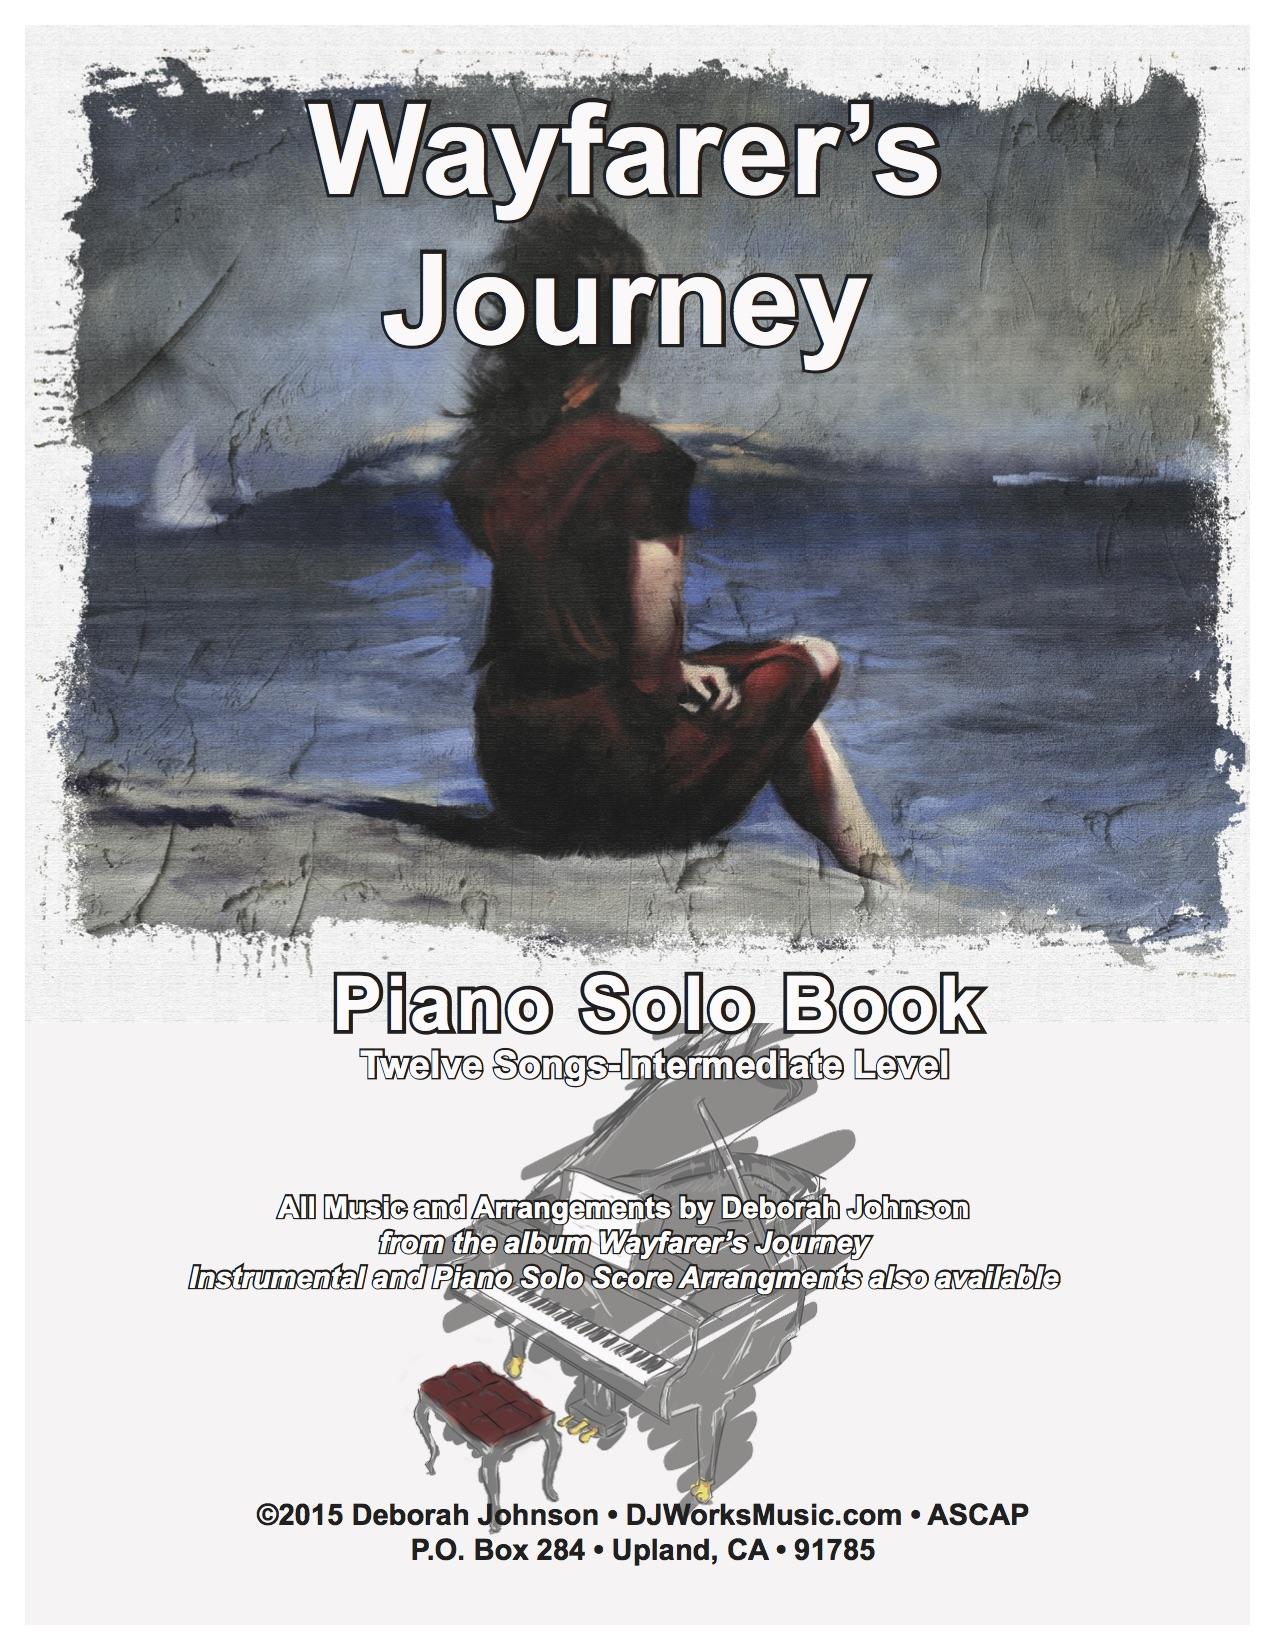 Wayfarers Journey Book Cover-Deborah Johnson